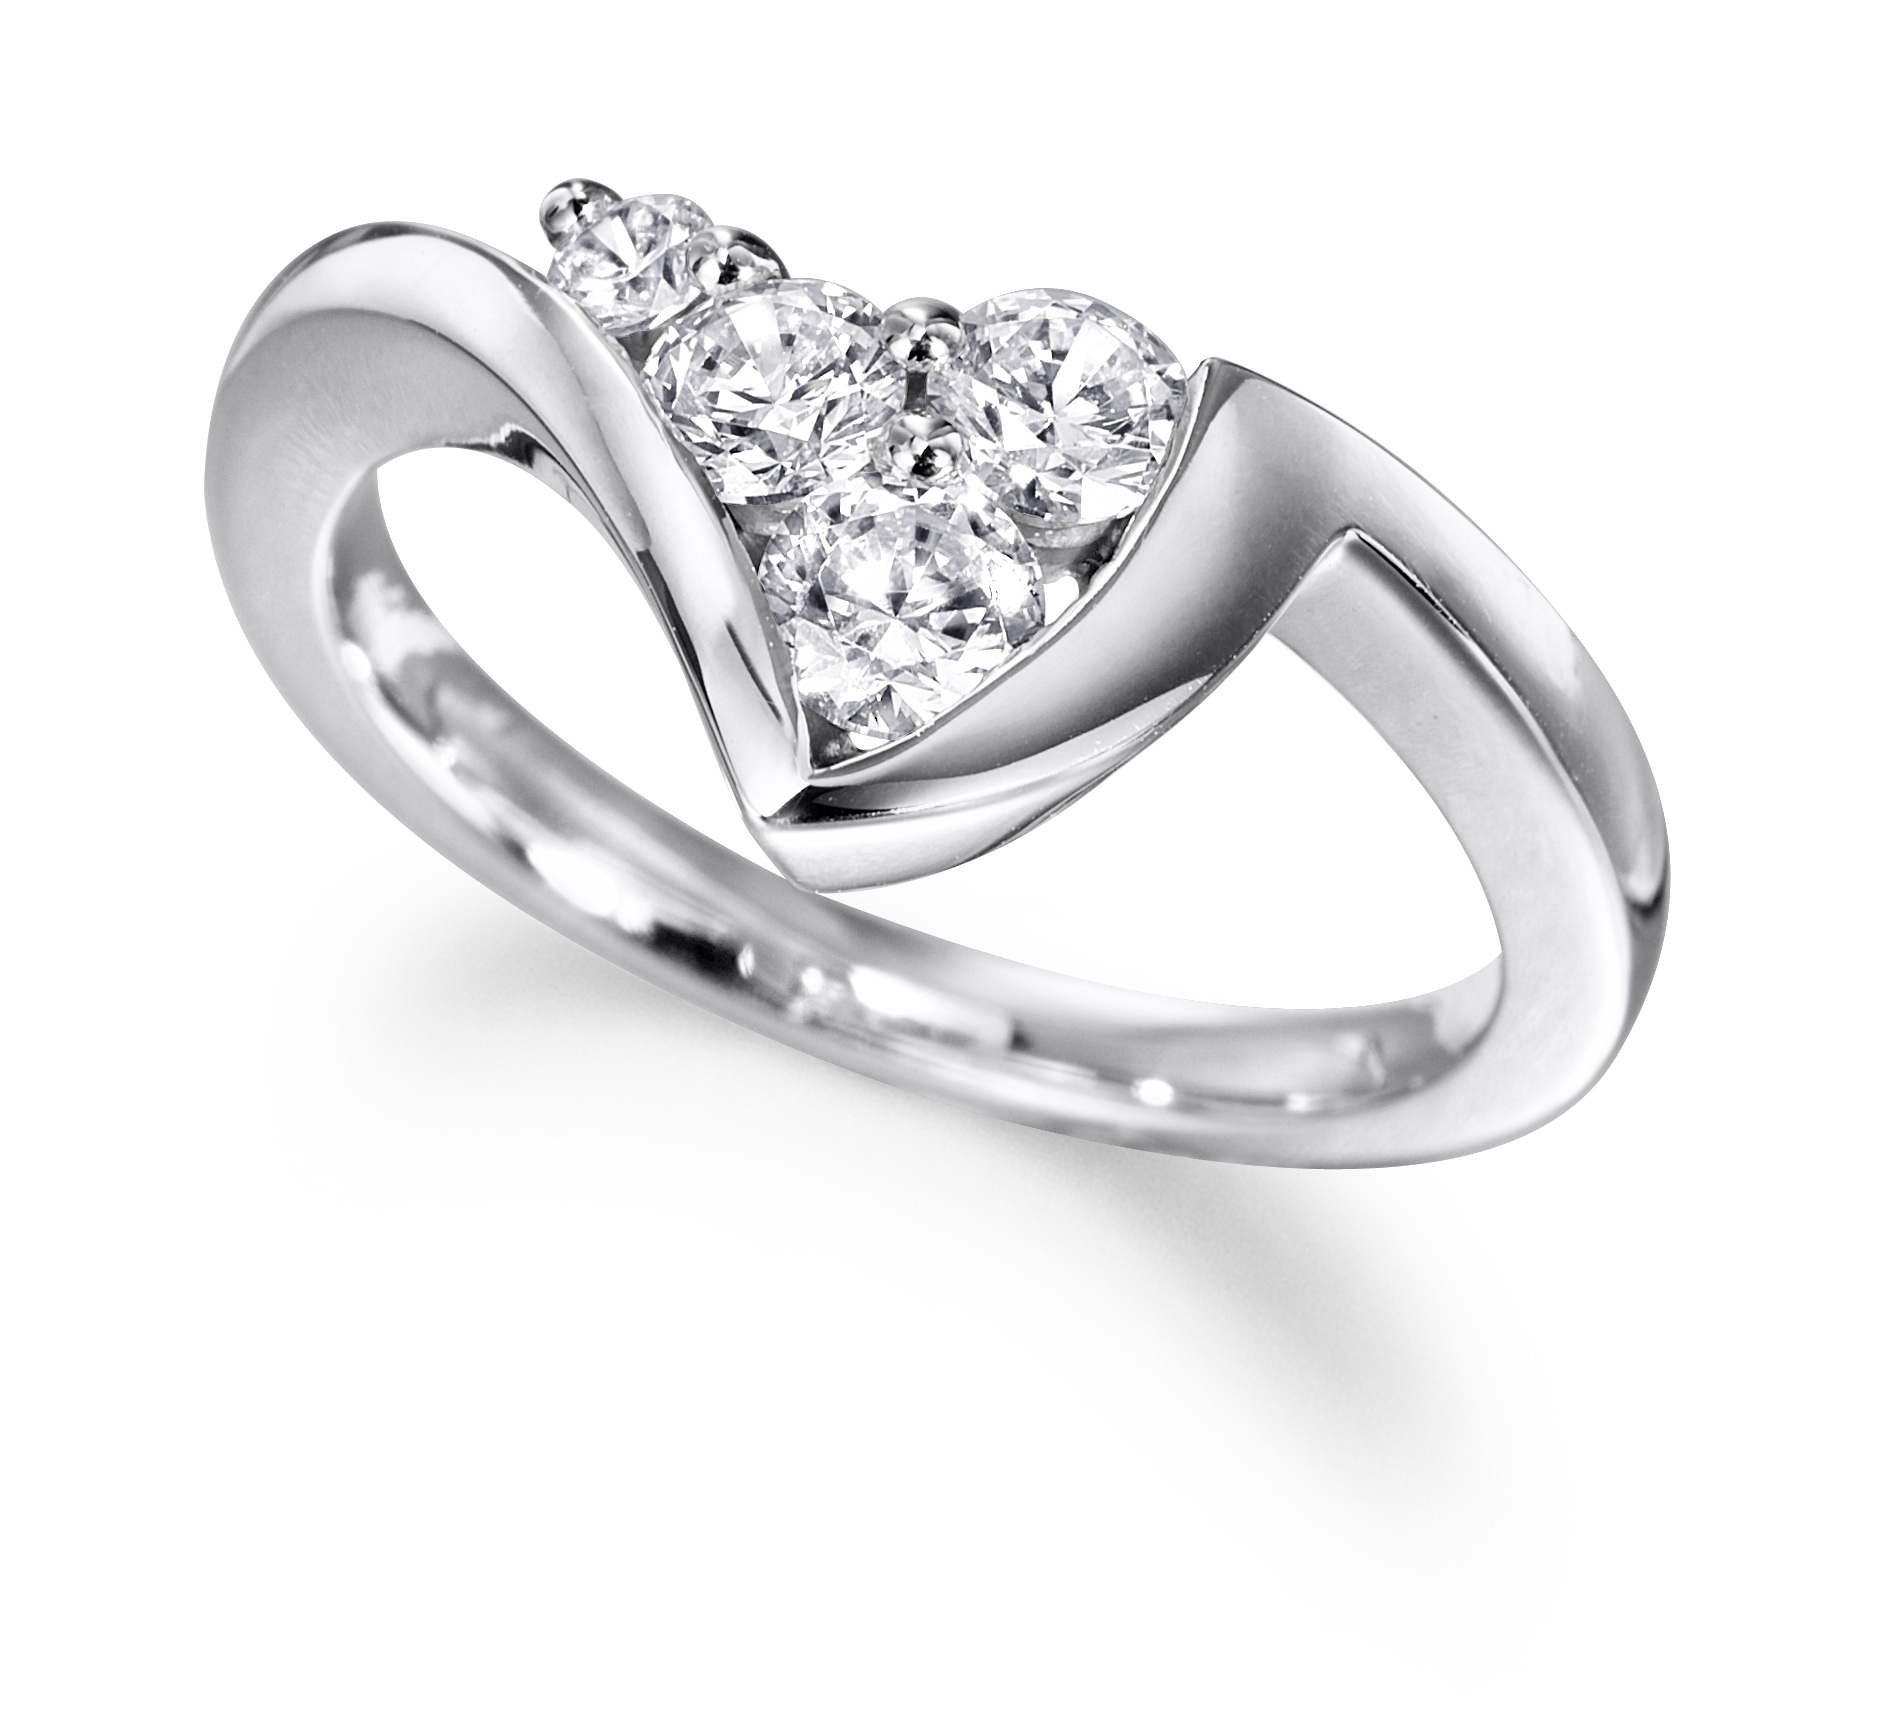 Voltaire Diamonds 4 Diamond Ring